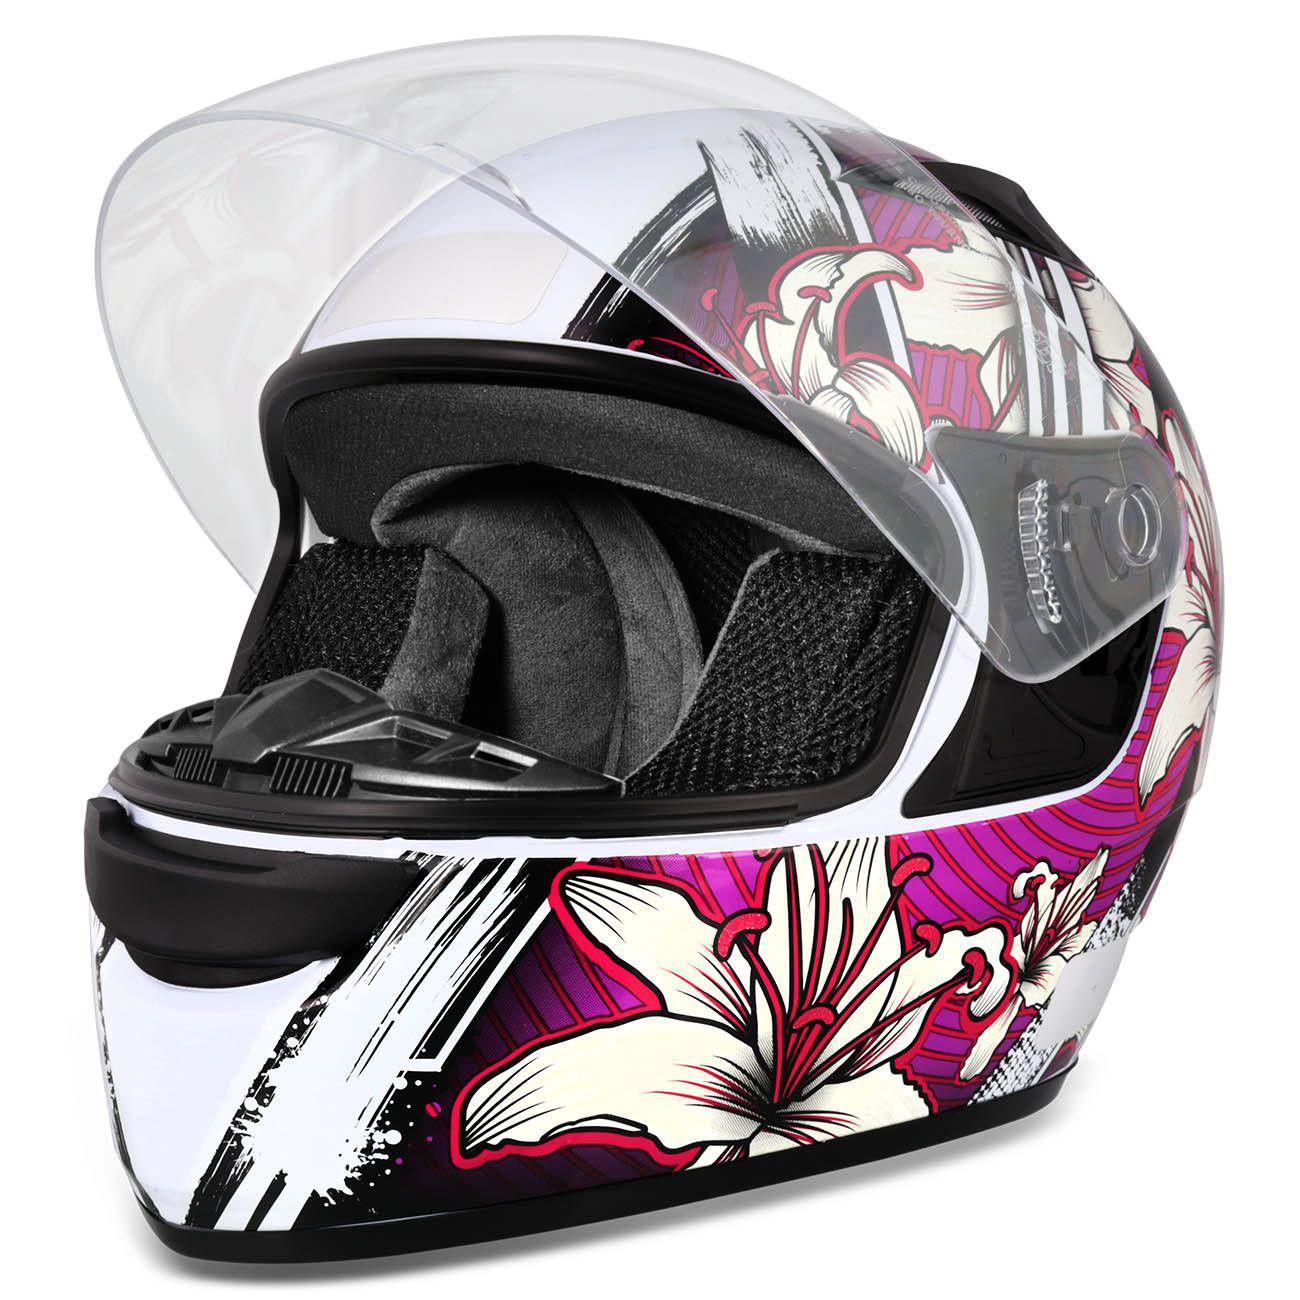 Capacete Fechado EBF E0X Flowers Feminino Branco e Lilás Moto - Ebf  capacetes R  179,90 à vista. Adicionar à sacola 3d9ddf3b6f